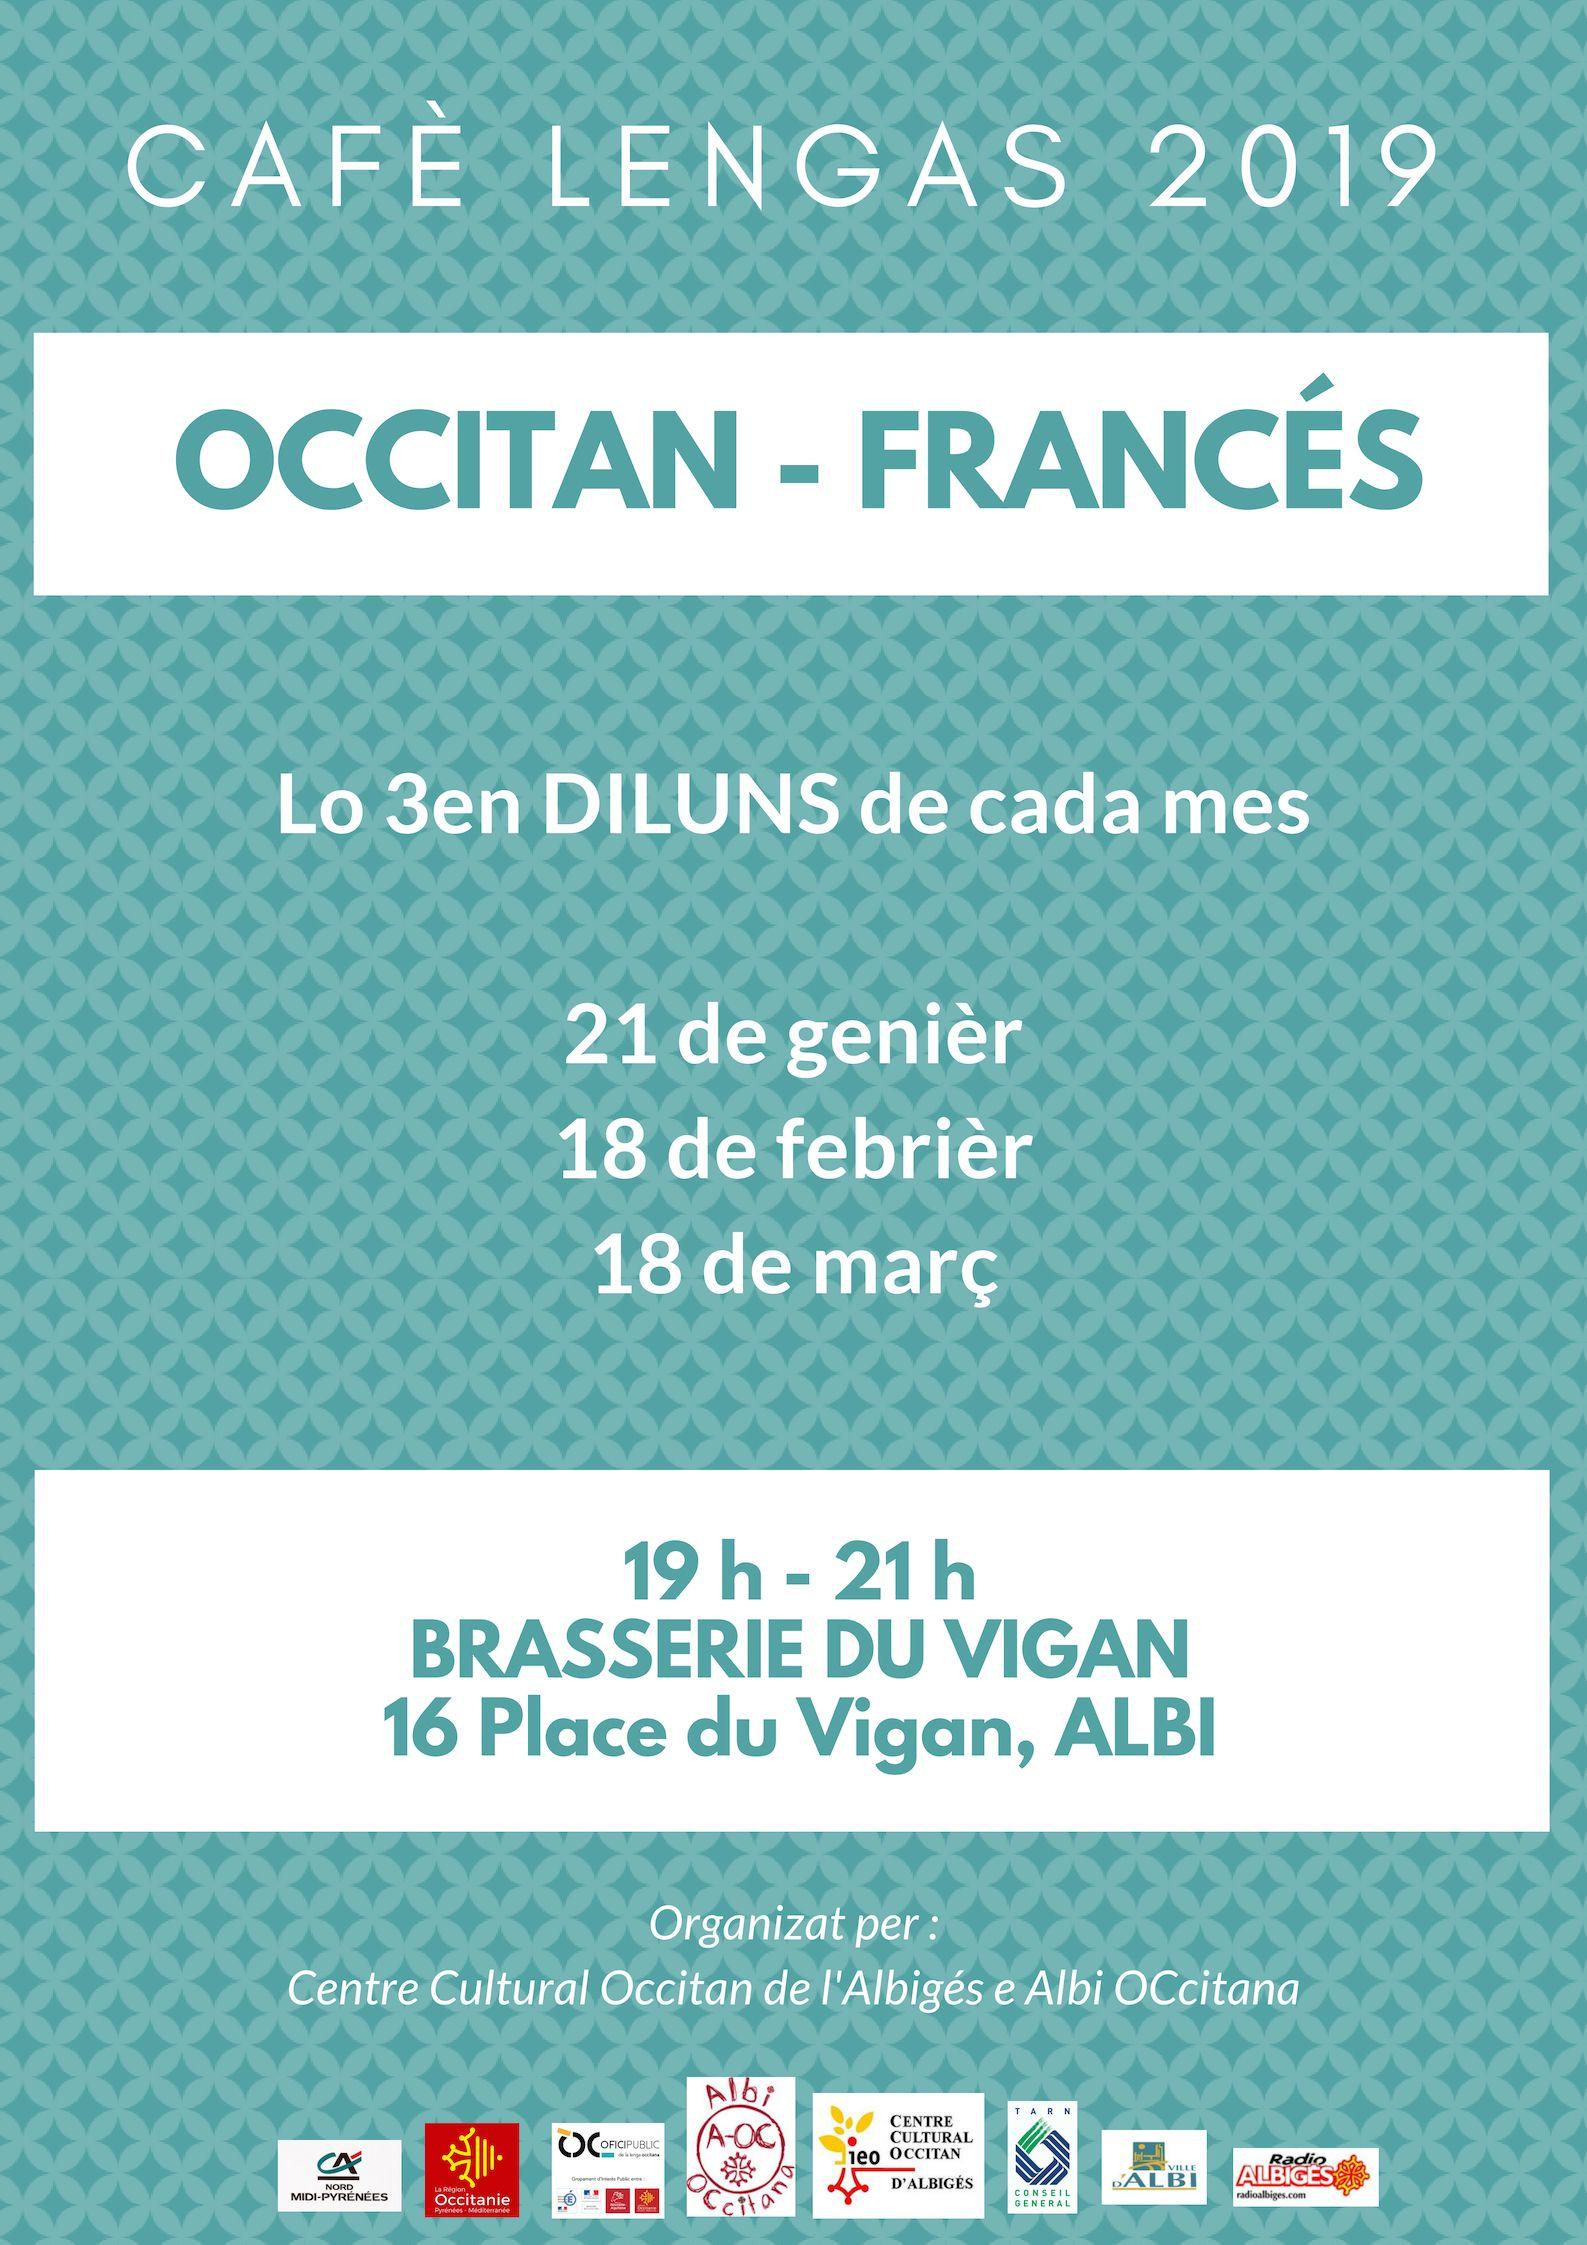 Cafè de las lengas francès/occitan 21 de genièr